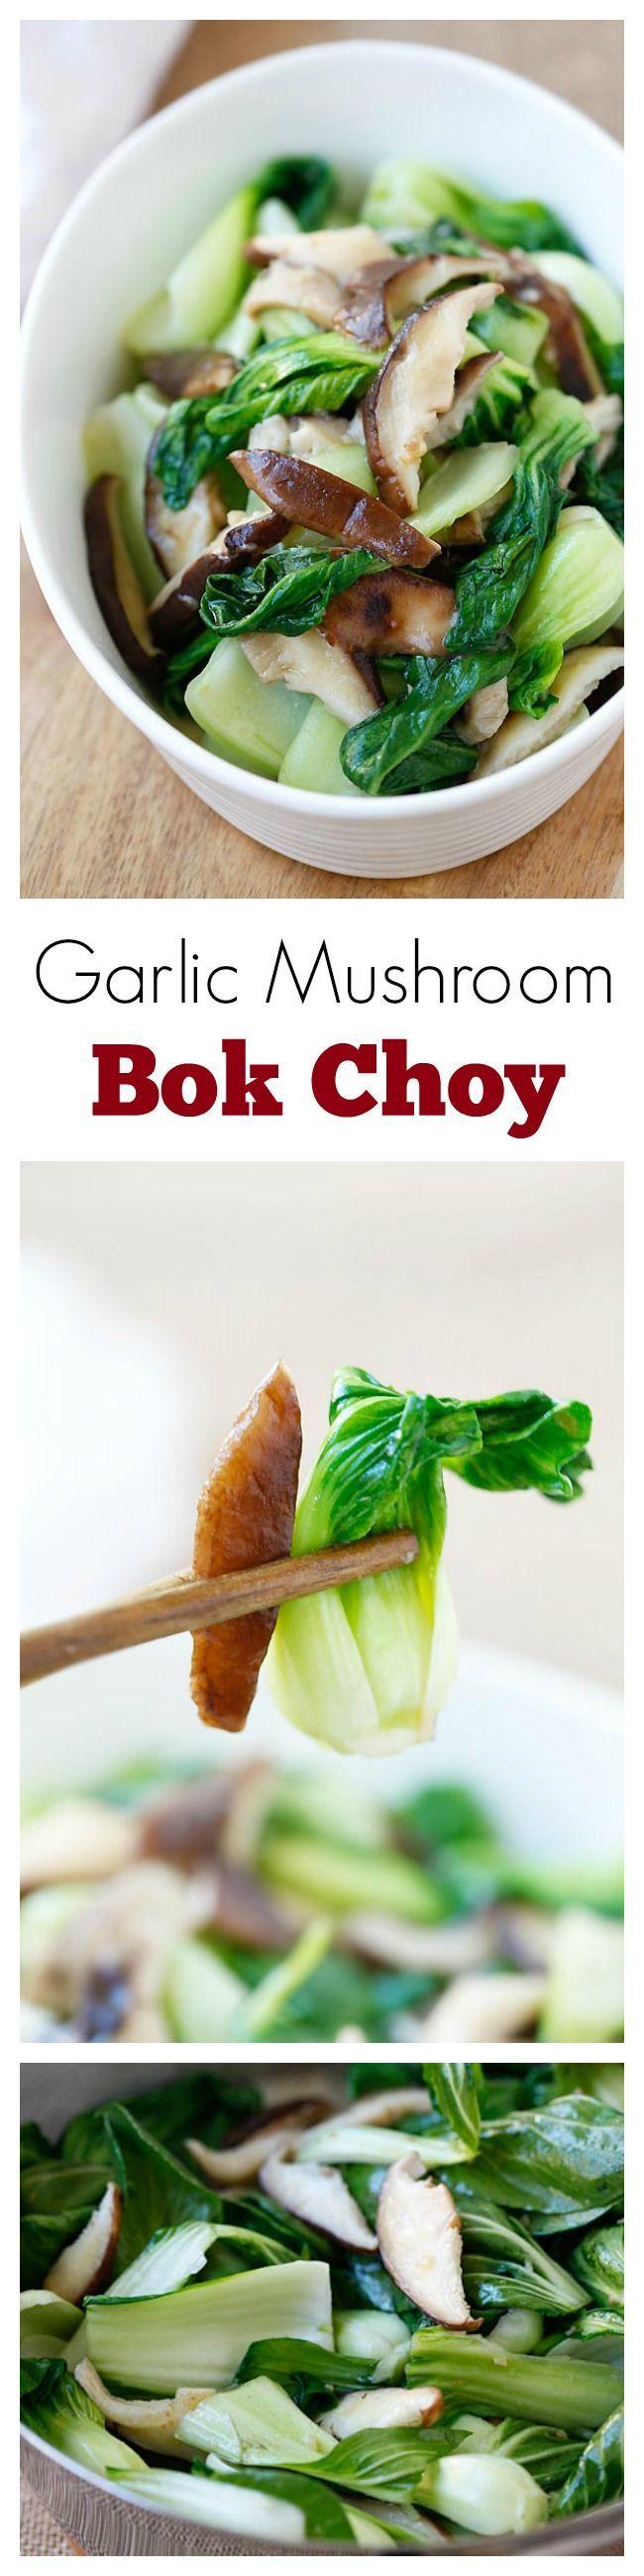 arlic Mushroom Bok Choy – the easiest, healthiest, and best veggie dish with bok choy, mushroom and garlic. 3 ingredients & 10 minutes to make   rasamalaysia.com   #veggie